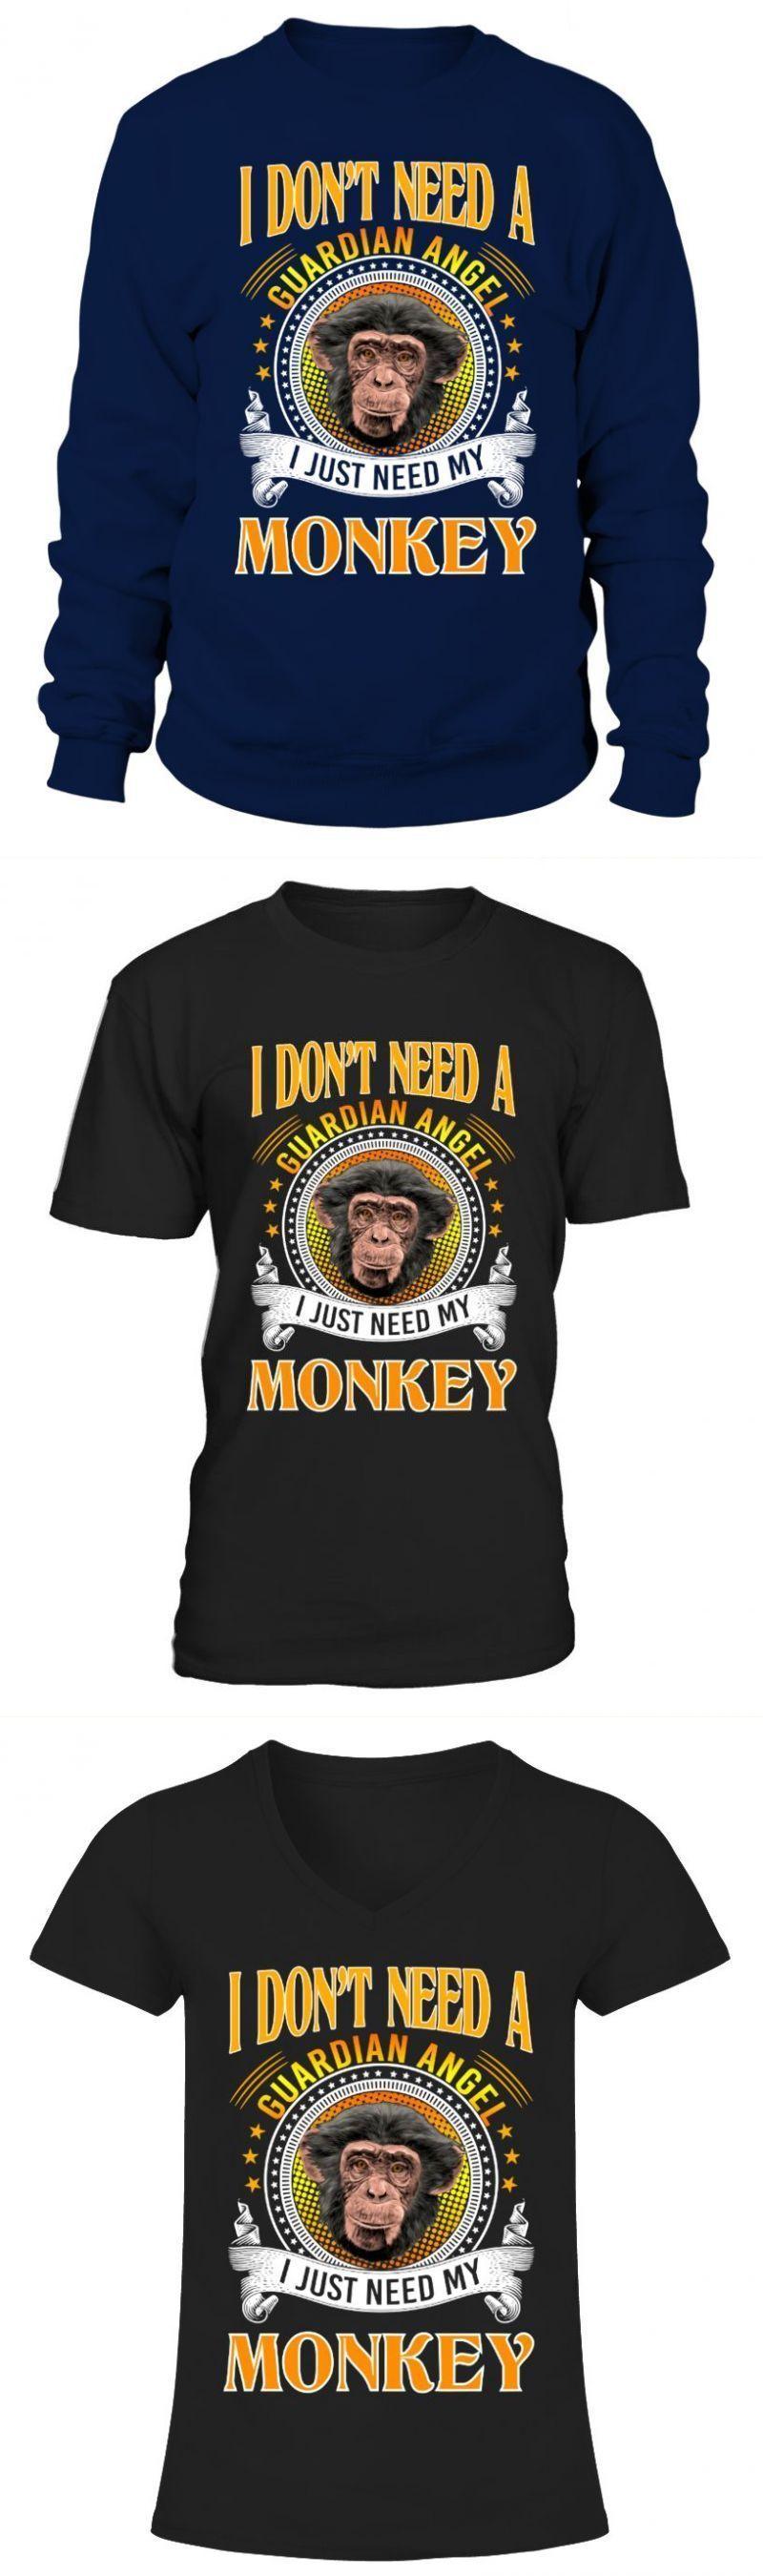 Gas monkey garage t shirt monkey a guardian angel brass monkey t shirt #gasmonkeygarage Gas monkey garage t shirt monkey a guardian angel brass monkey t shirt #gas #monkey #garage #shirt #guardian #angel #brass #sweatshirt #unisex #round #neck #t-shirt #v-neck #woman #gasmonkeygarage